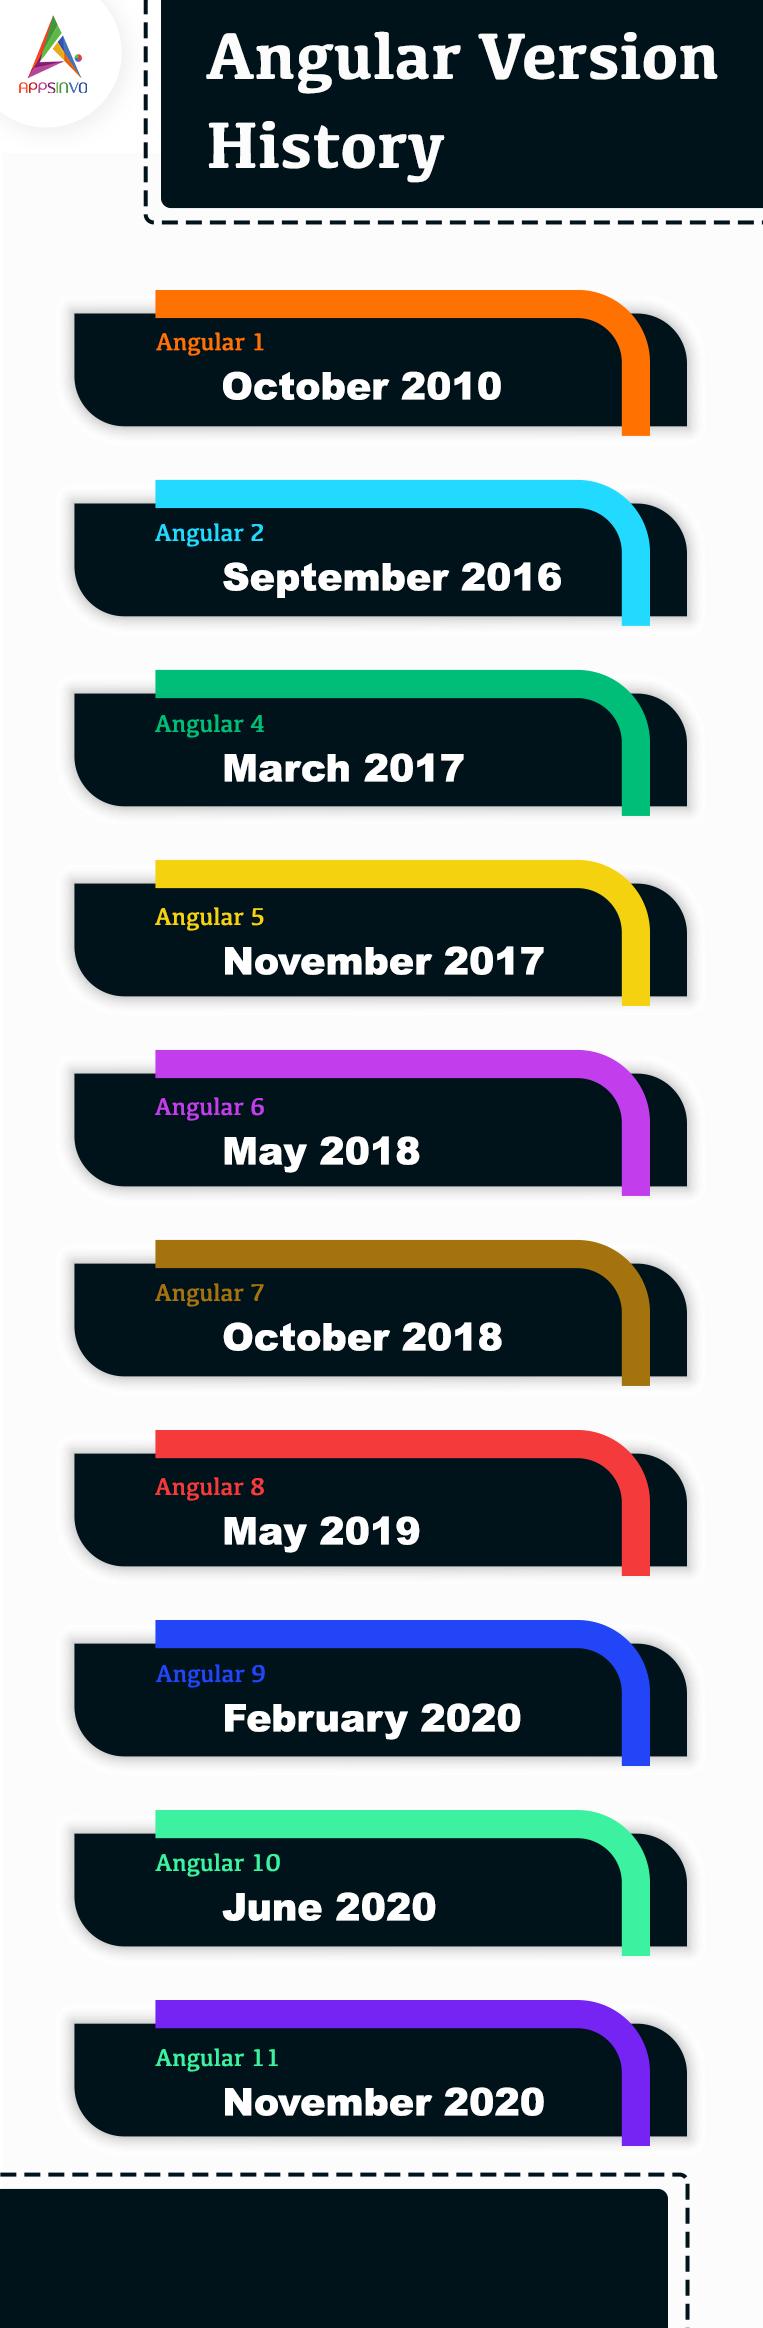 History of the Angular Version 11-byappsinvo.